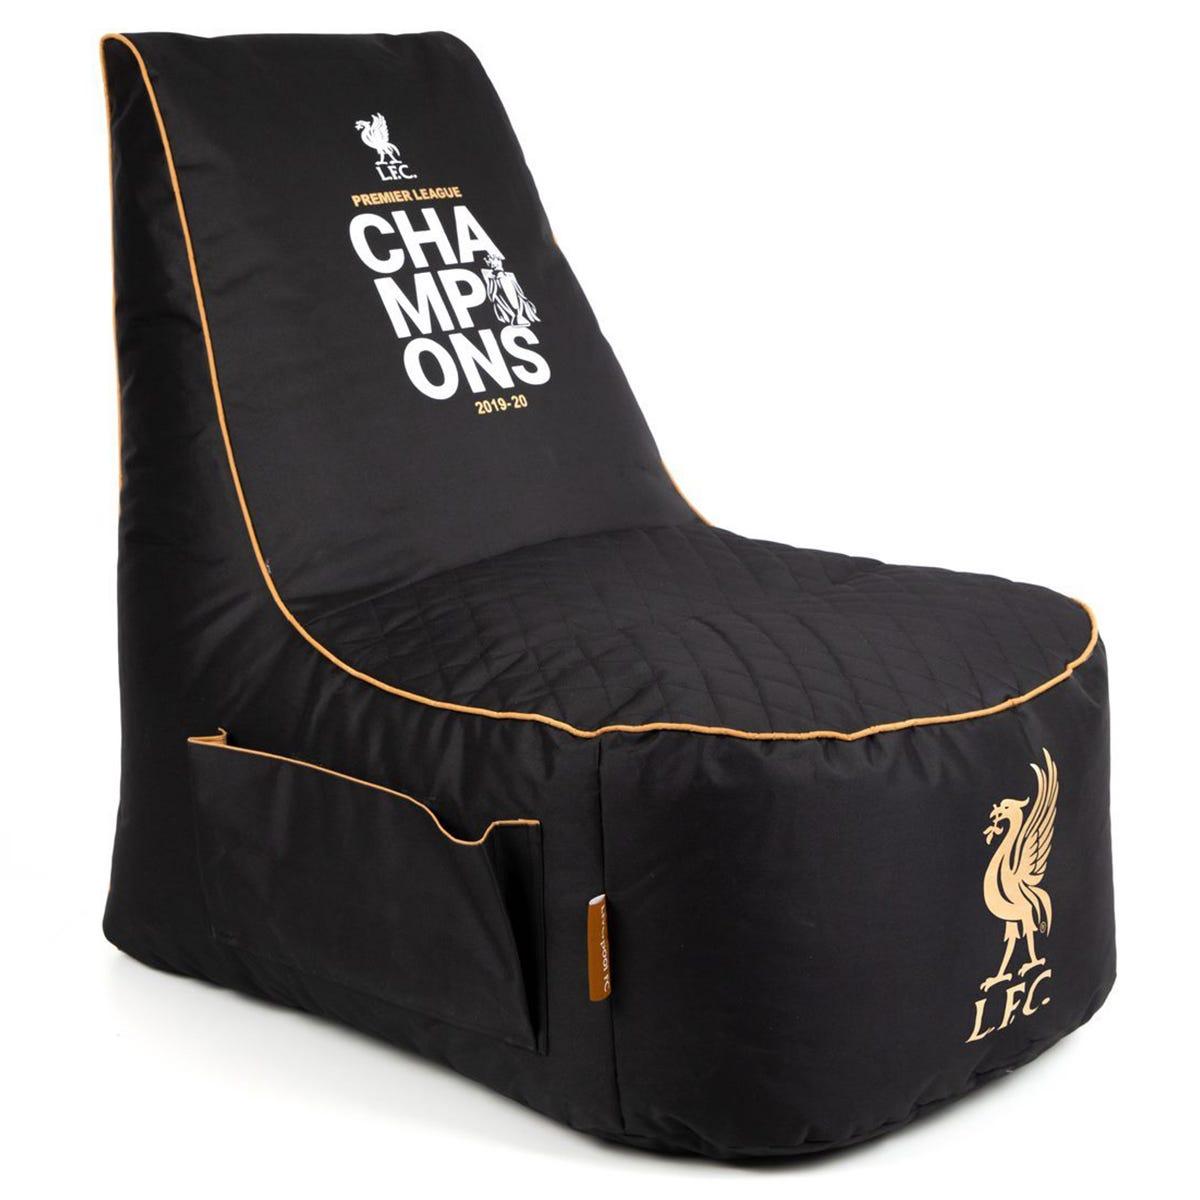 Province 5 Liverpool FC Breakaway PL Winners Edition Gaming Bean Bag Chair